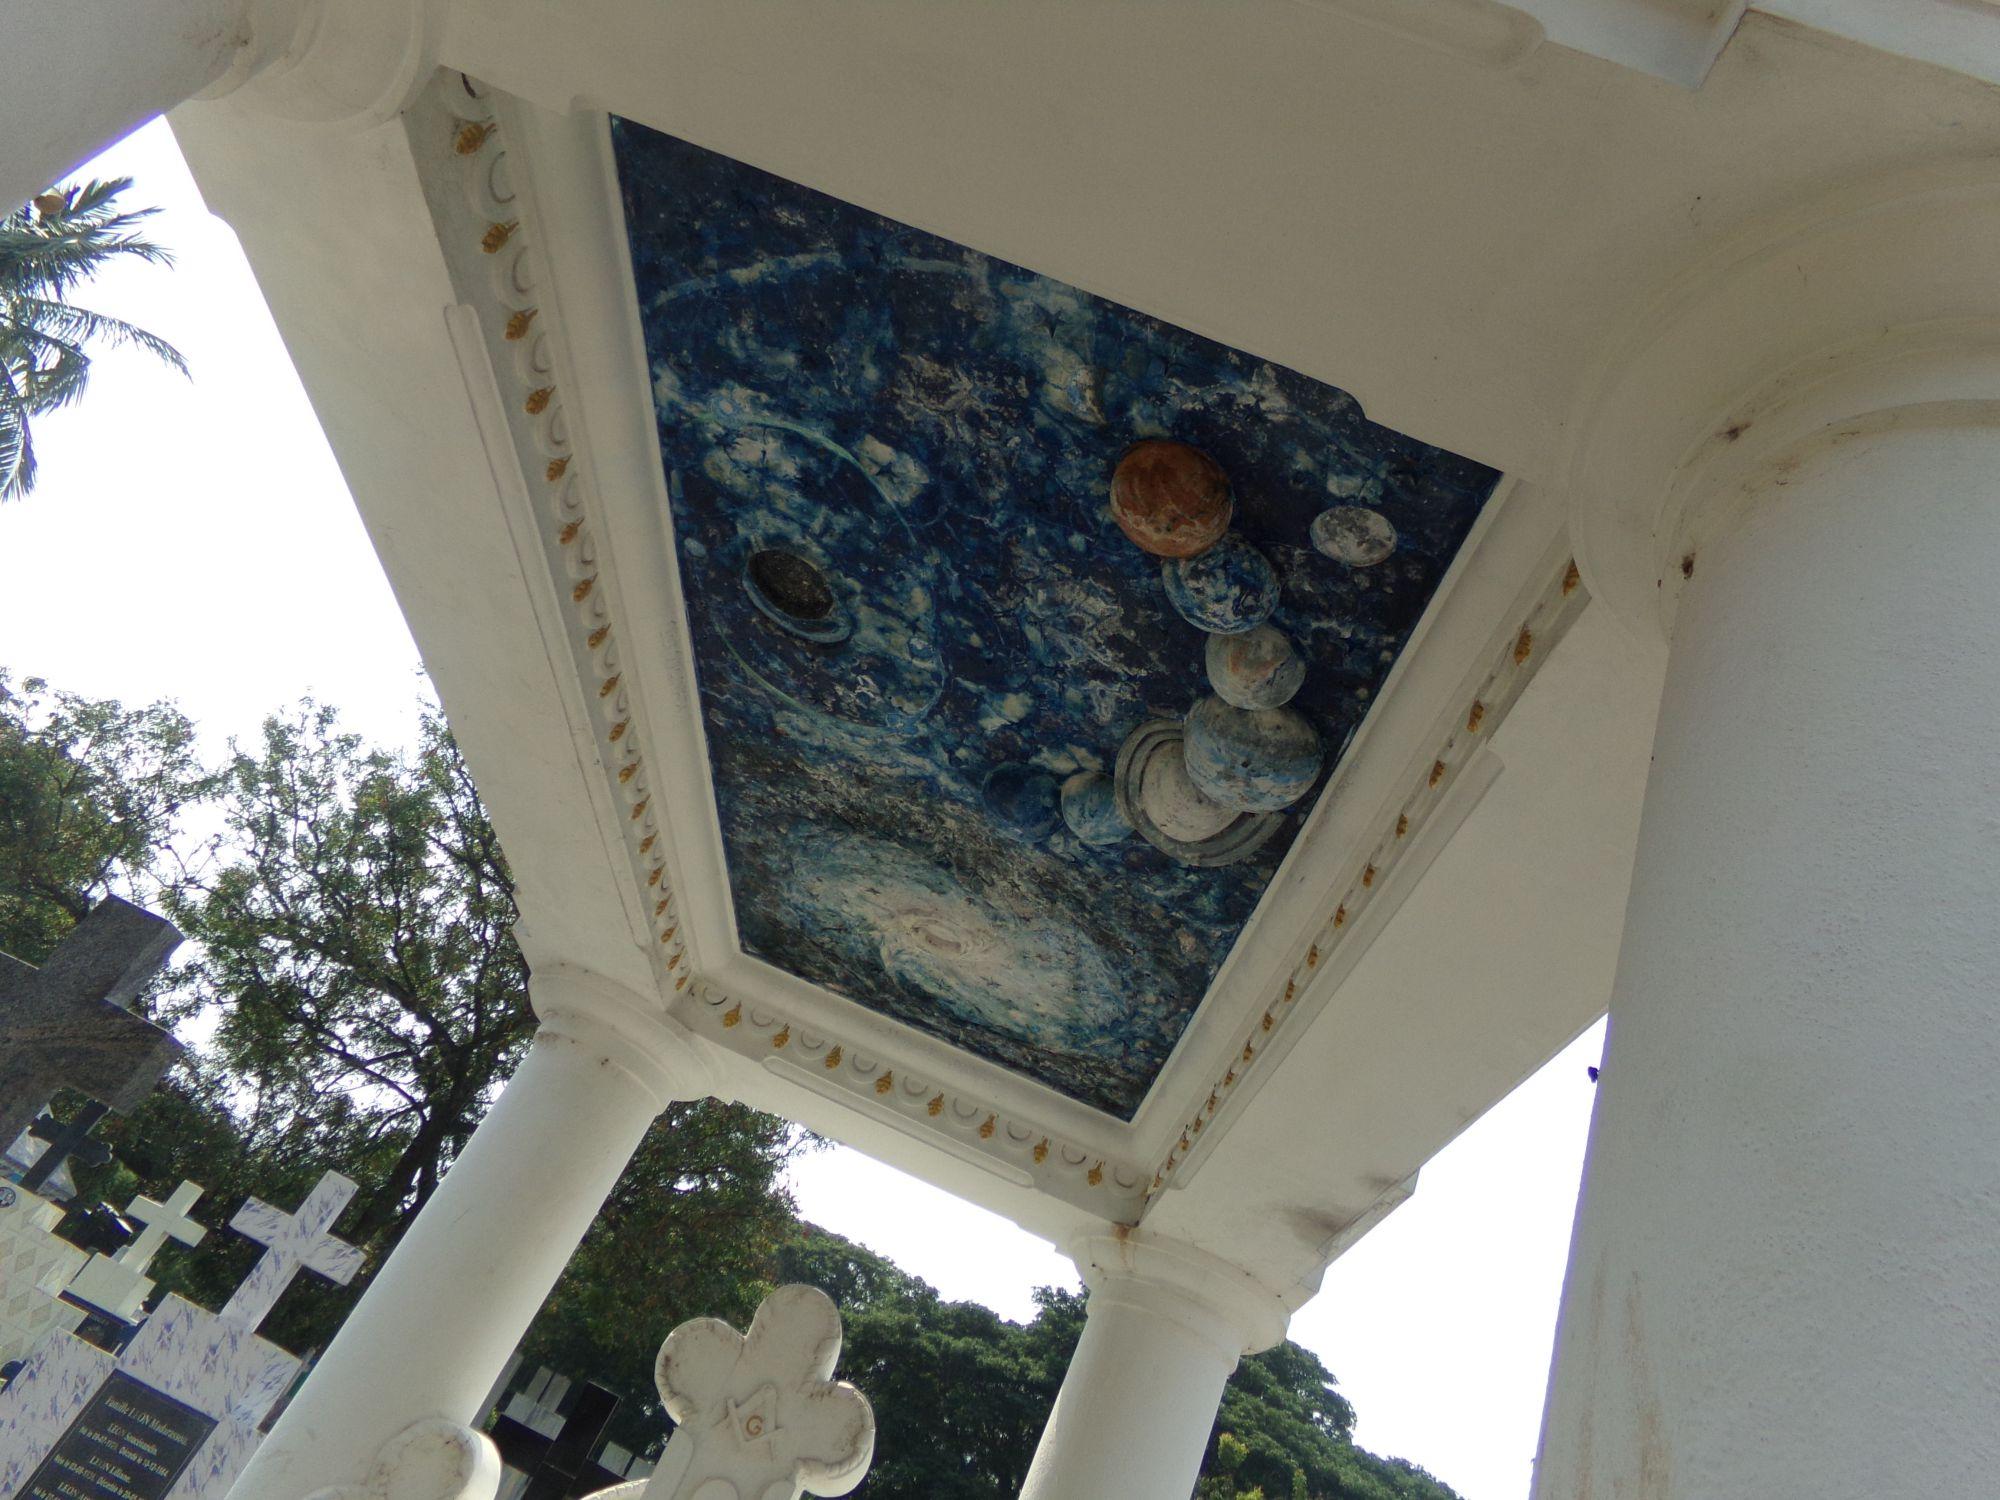 pondi detail tombe cimetiere planete ciel